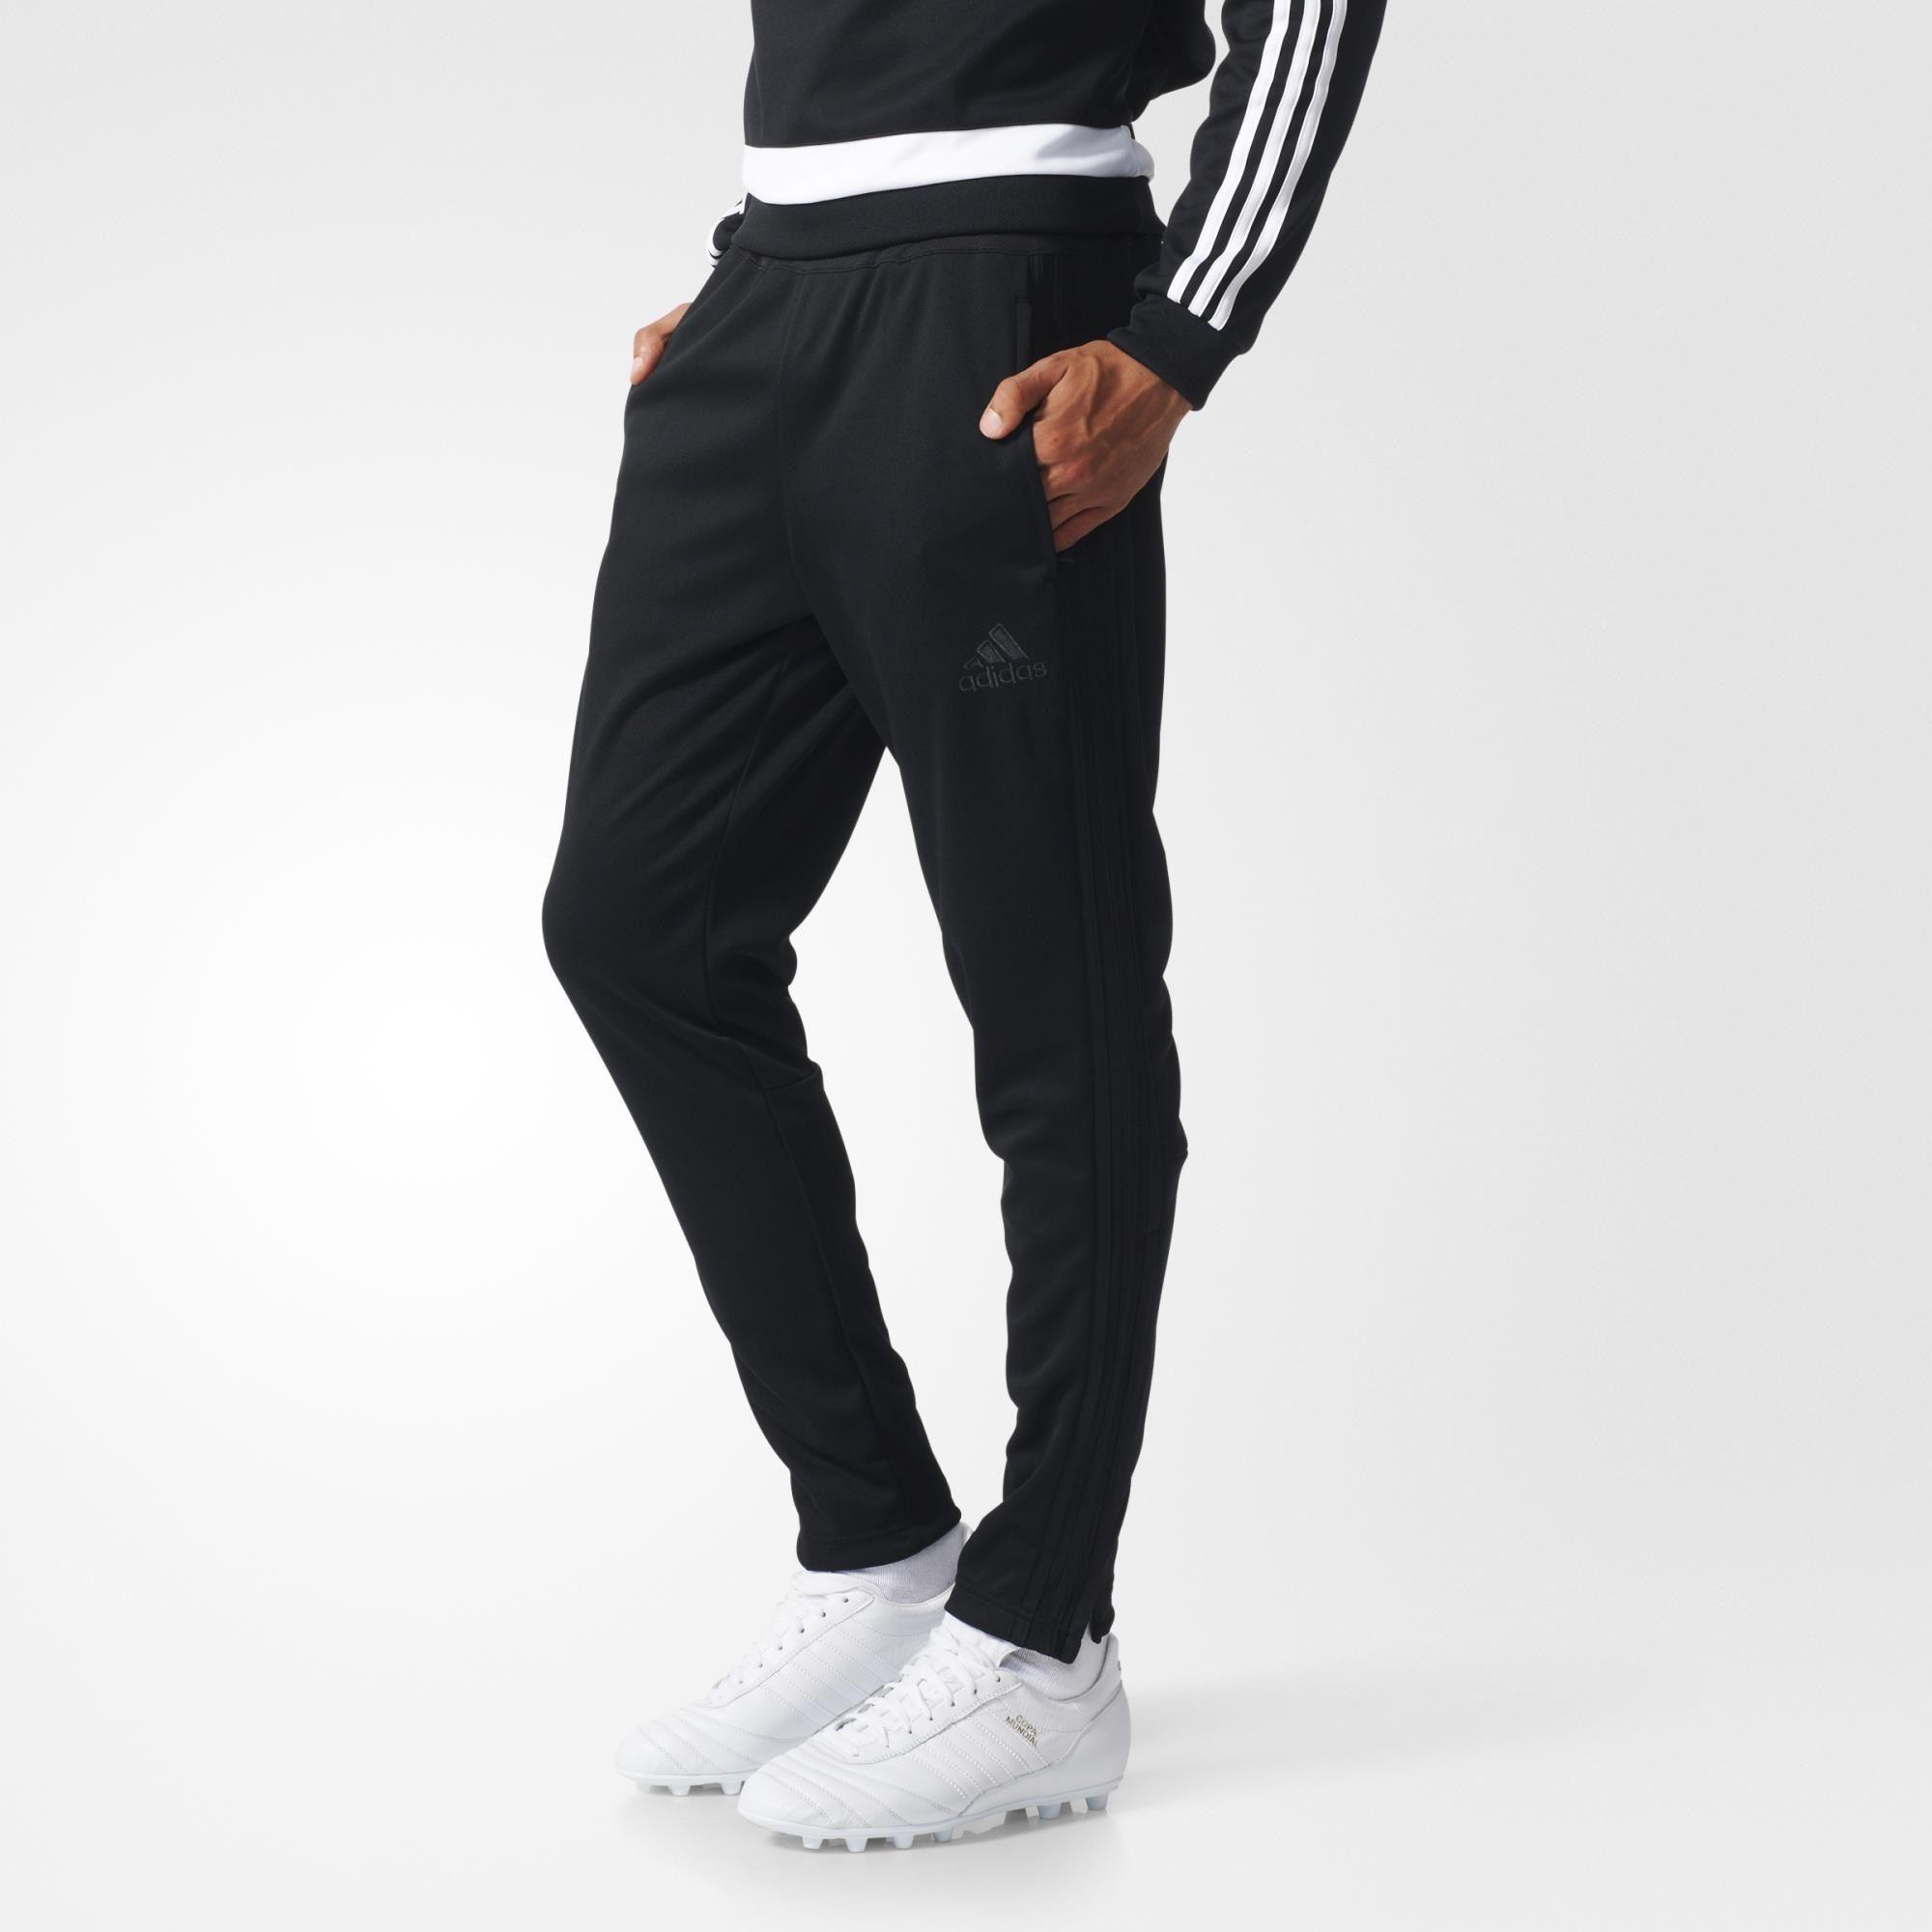 Pantalon d entraînement Tiro13 - noir adidas  263ee1cd5400